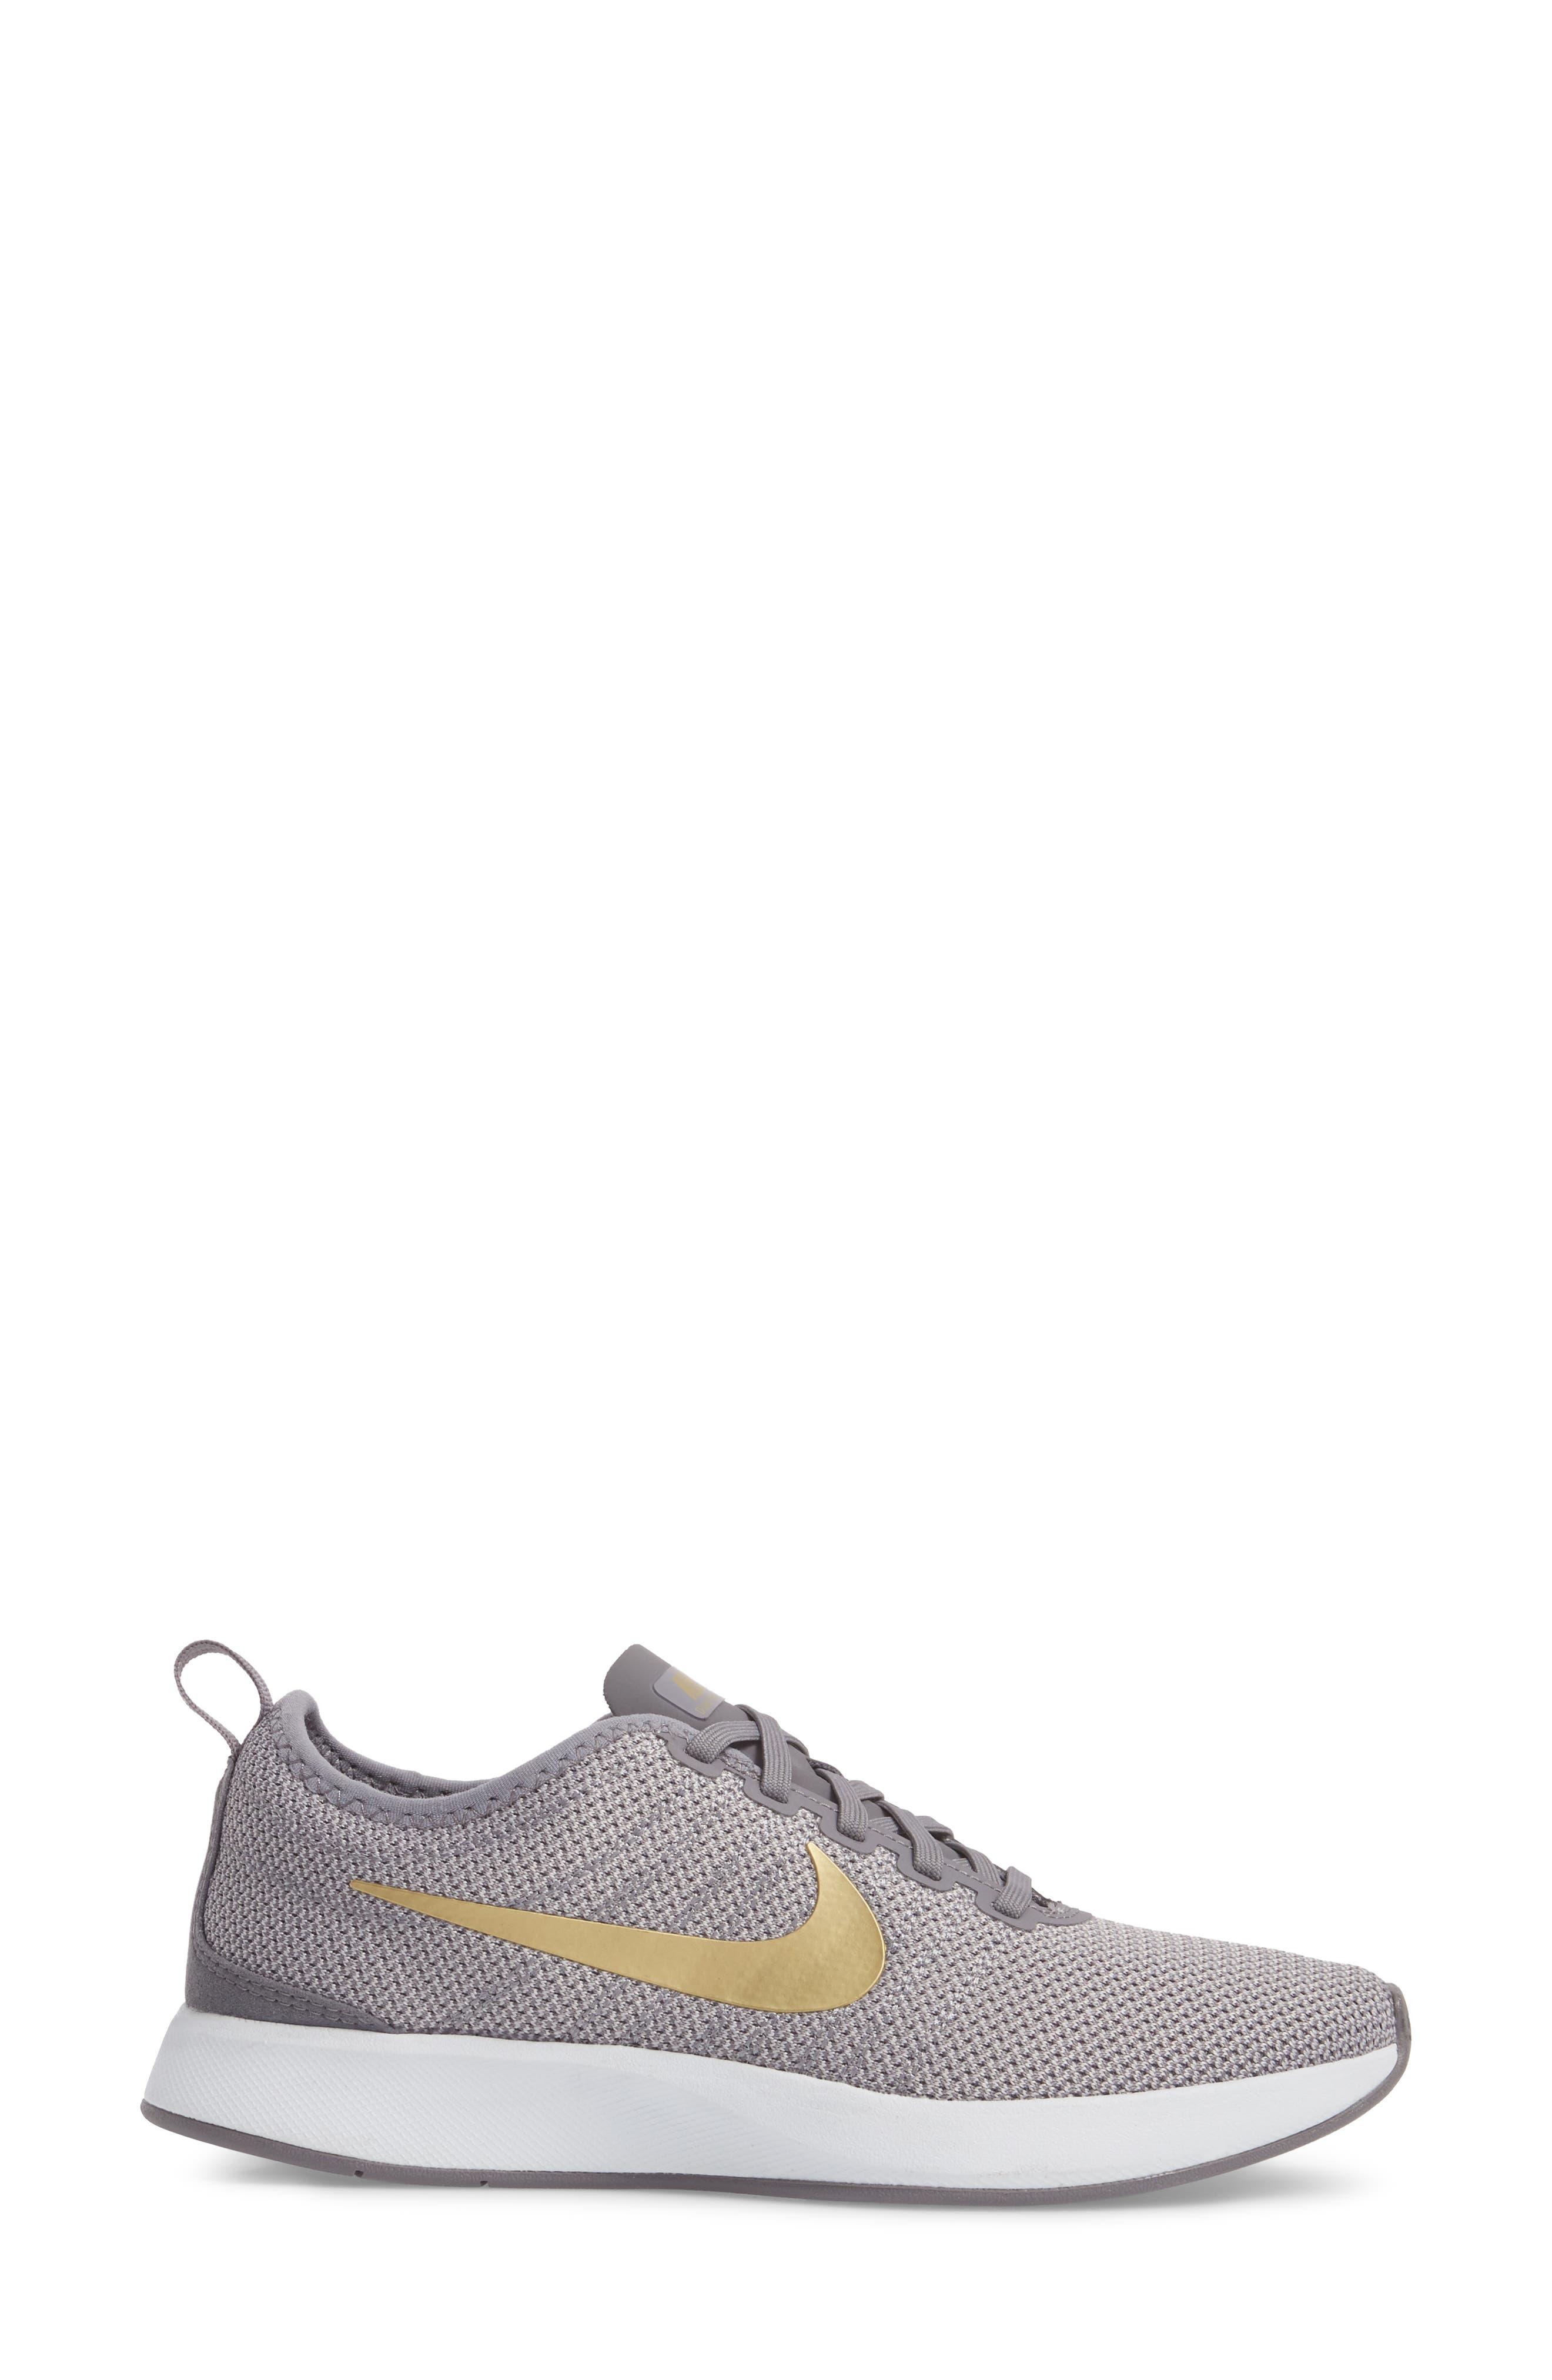 Dualtone Racer SE Sneaker,                             Alternate thumbnail 3, color,                             021